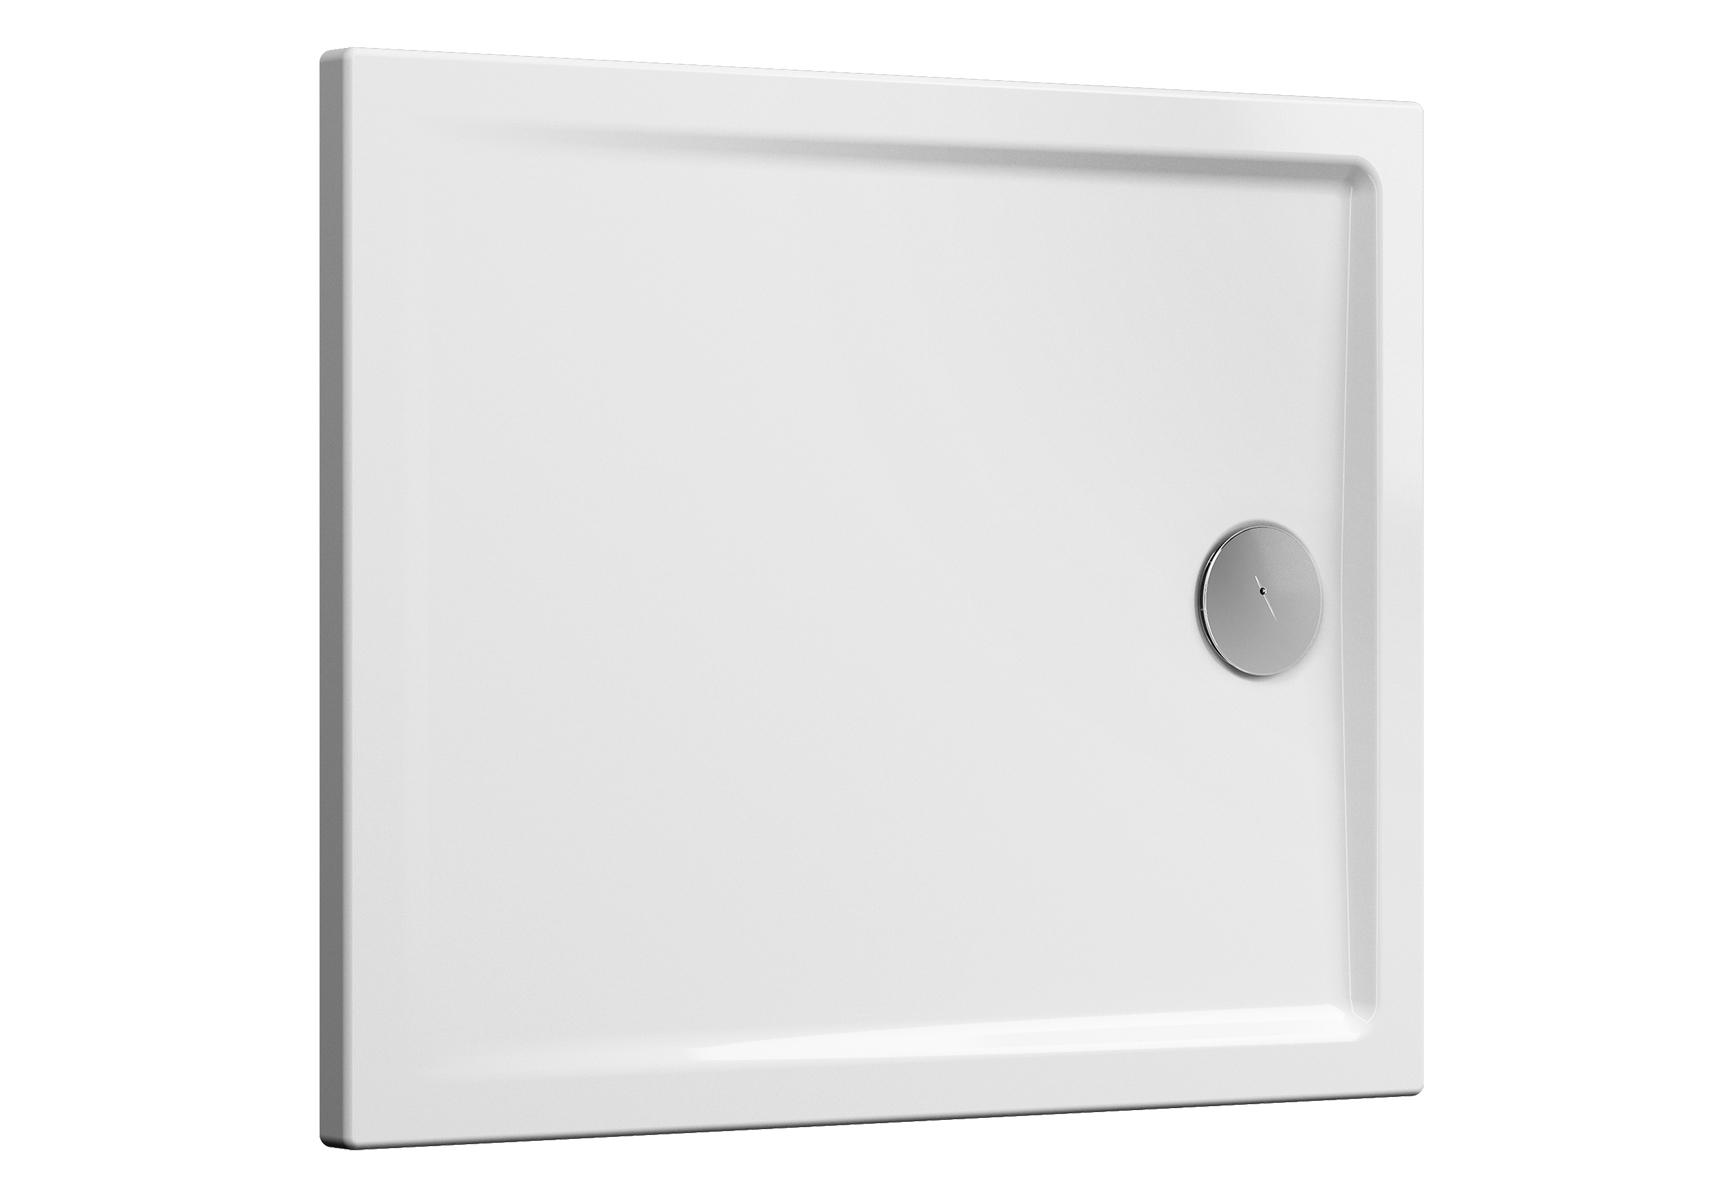 Cascade receveur ultra plat en céramique, 100  x  80 cm, blanc mat